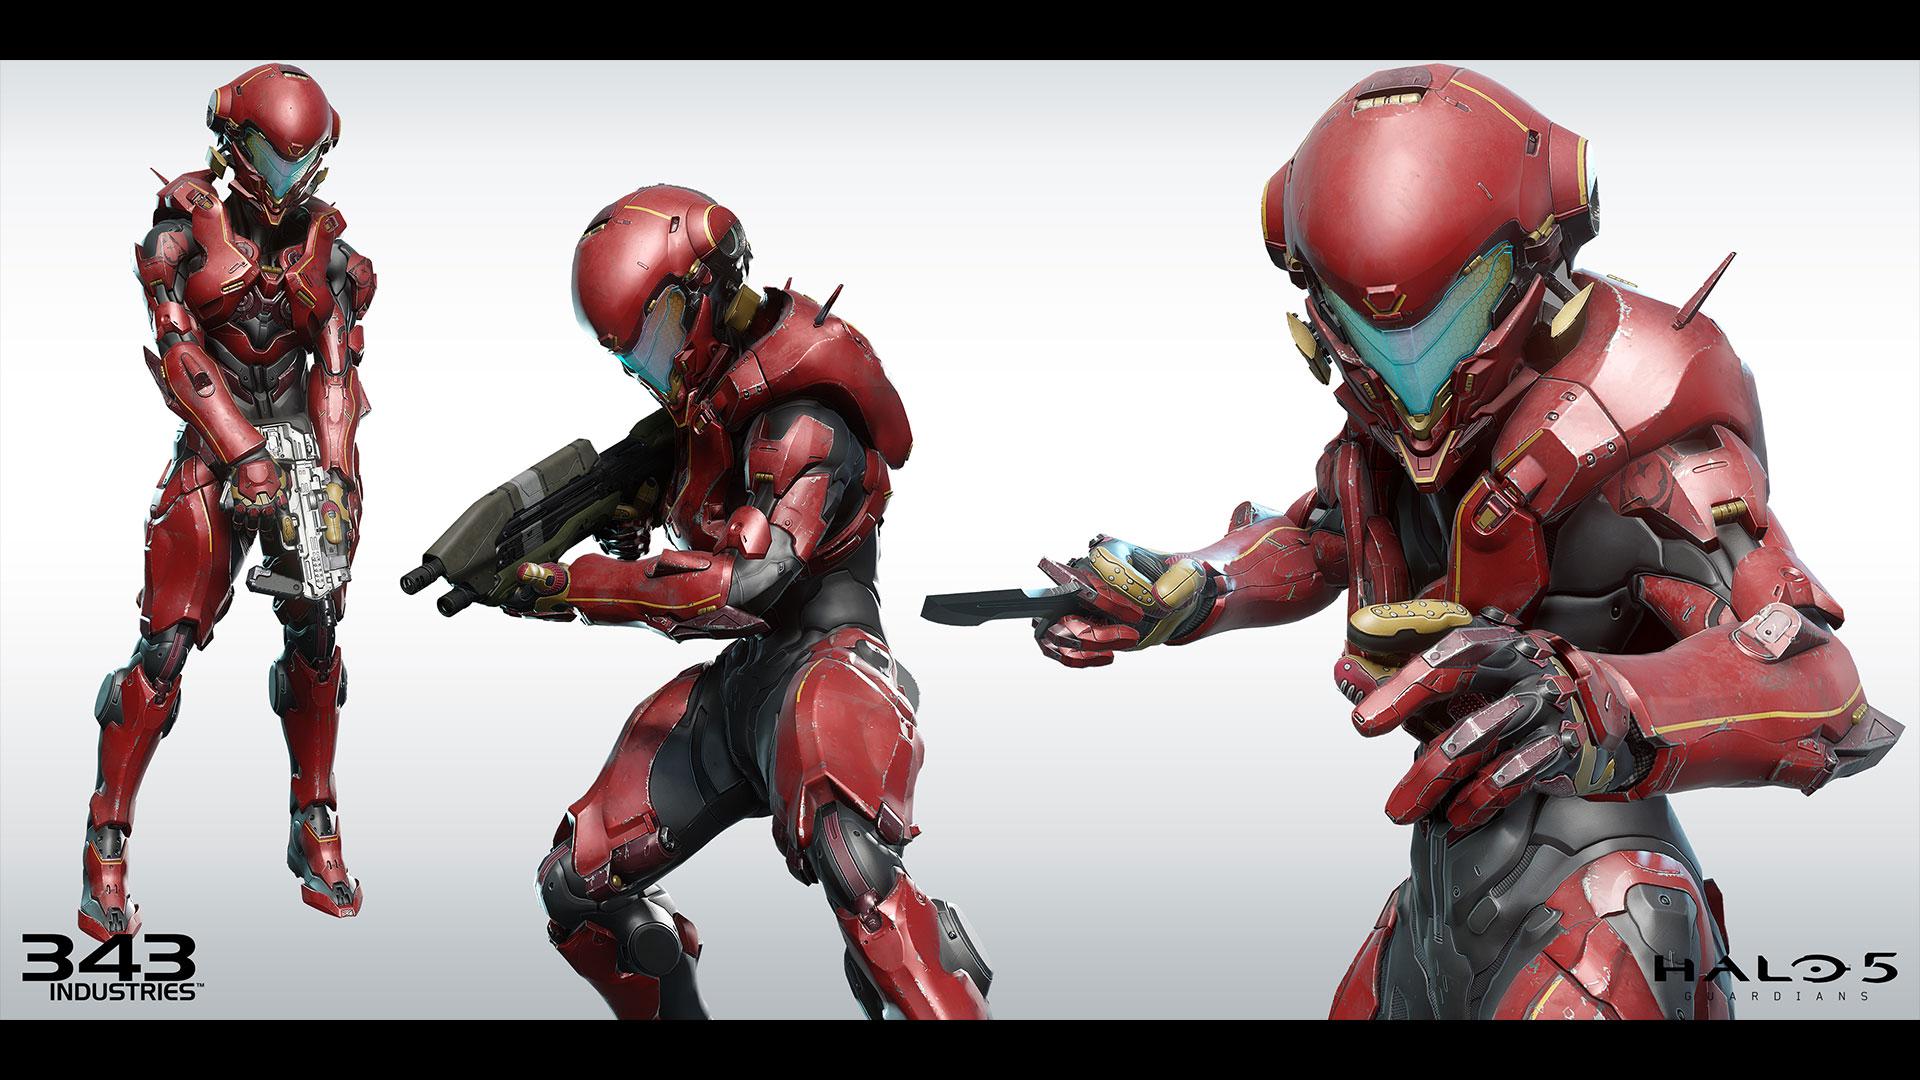 Halo 5 Art Showcase Halo 5 Guardians Halo Official Site